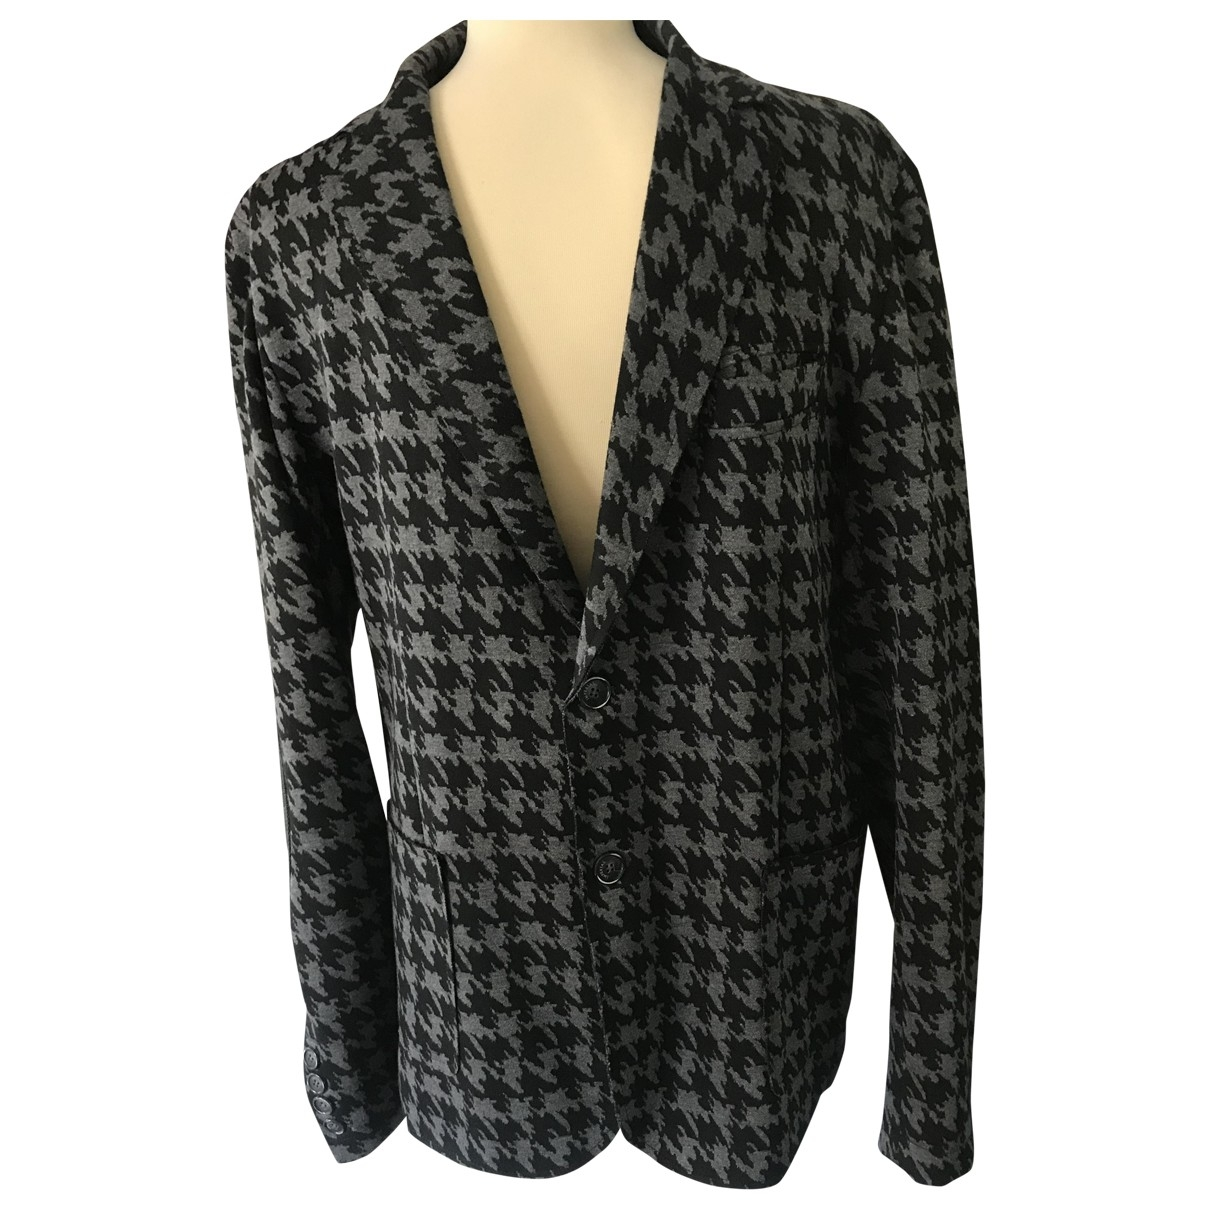 Impérial \N Anthracite Wool jacket  for Men XL International